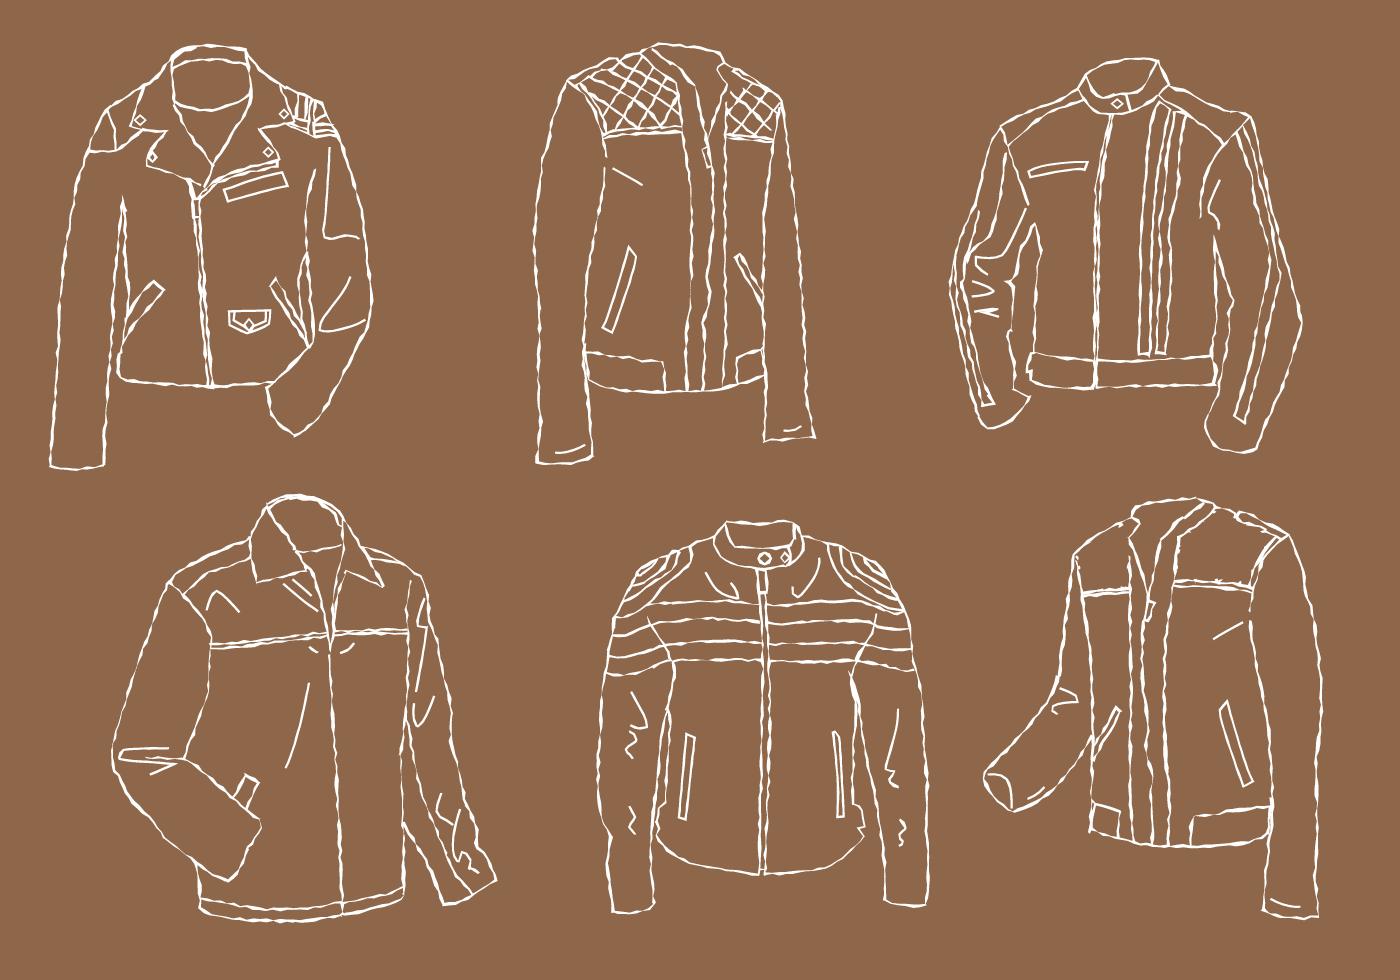 Line Drawing Jacket : Leather jacket line art vector set download free